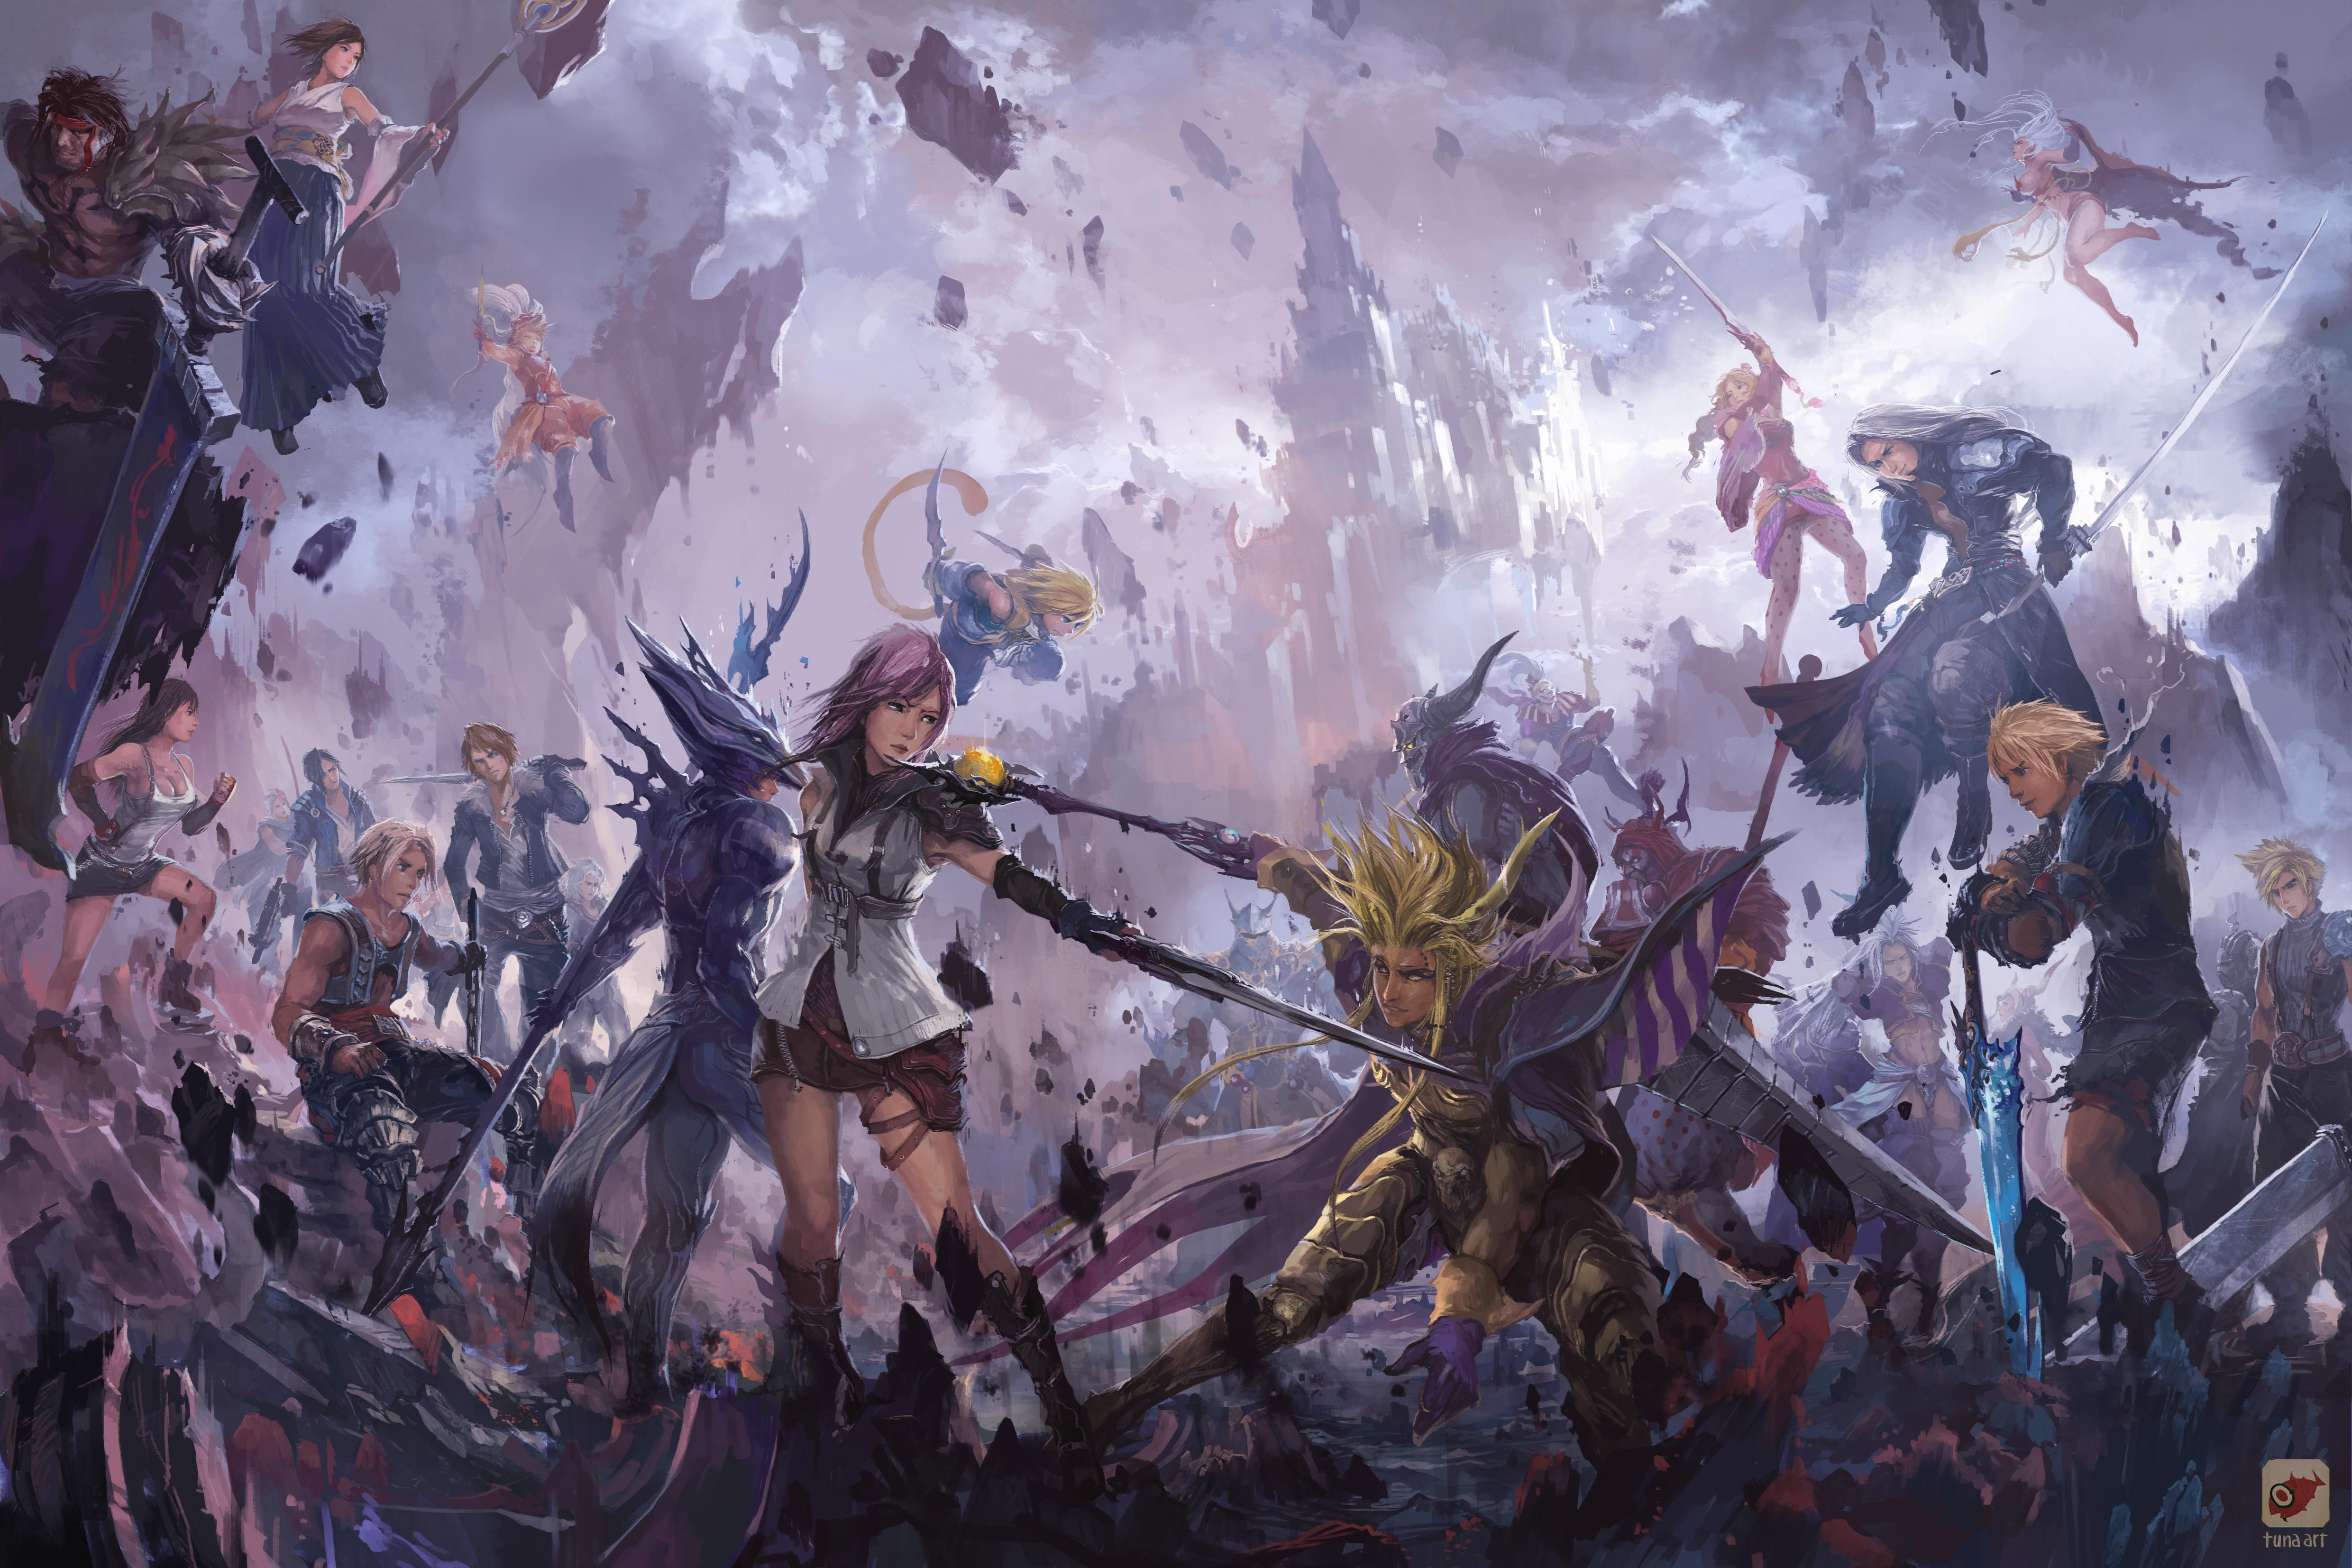 Final Fantasy Xv Wallpaper 4k 4961x3307 Download Hd Wallpaper Wallpapertip